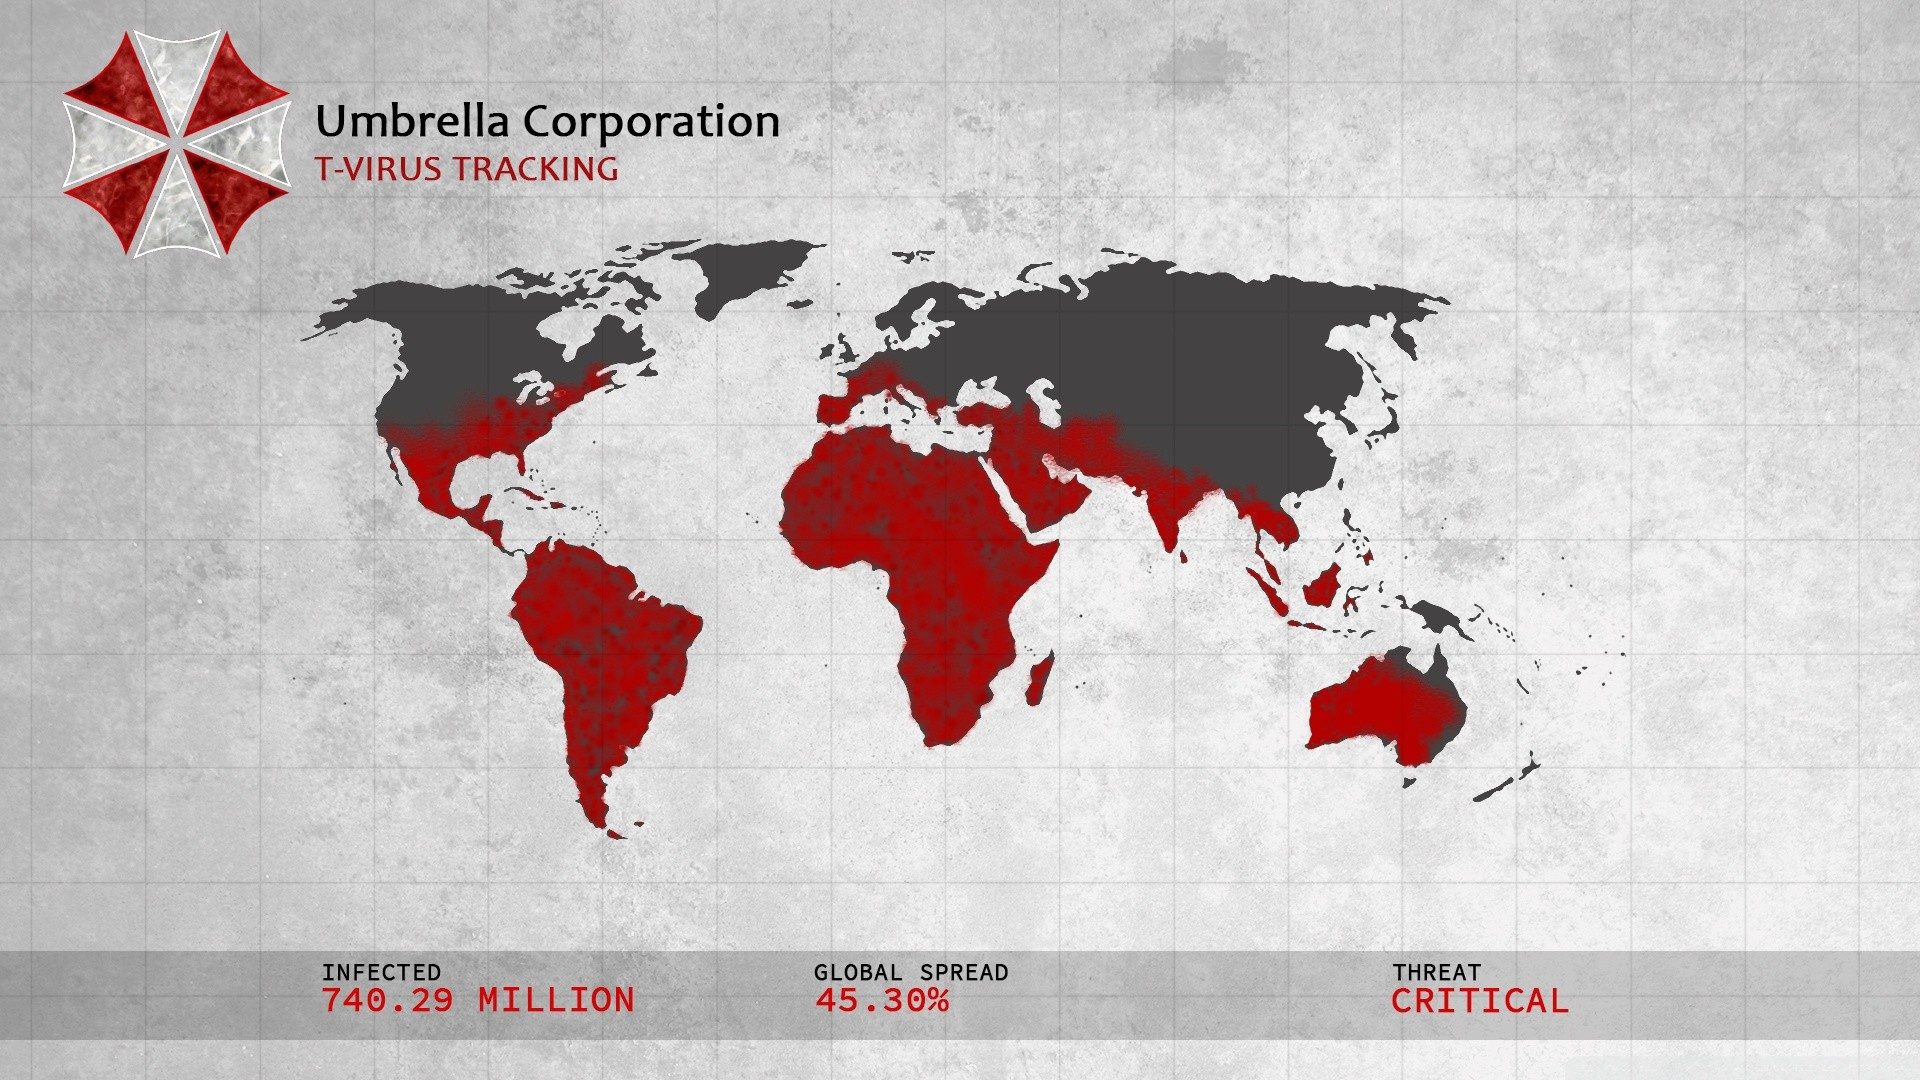 Resident evil umbrella corp wallpaper 72 images - Umbrella corporation wallpaper hd 1366x768 ...